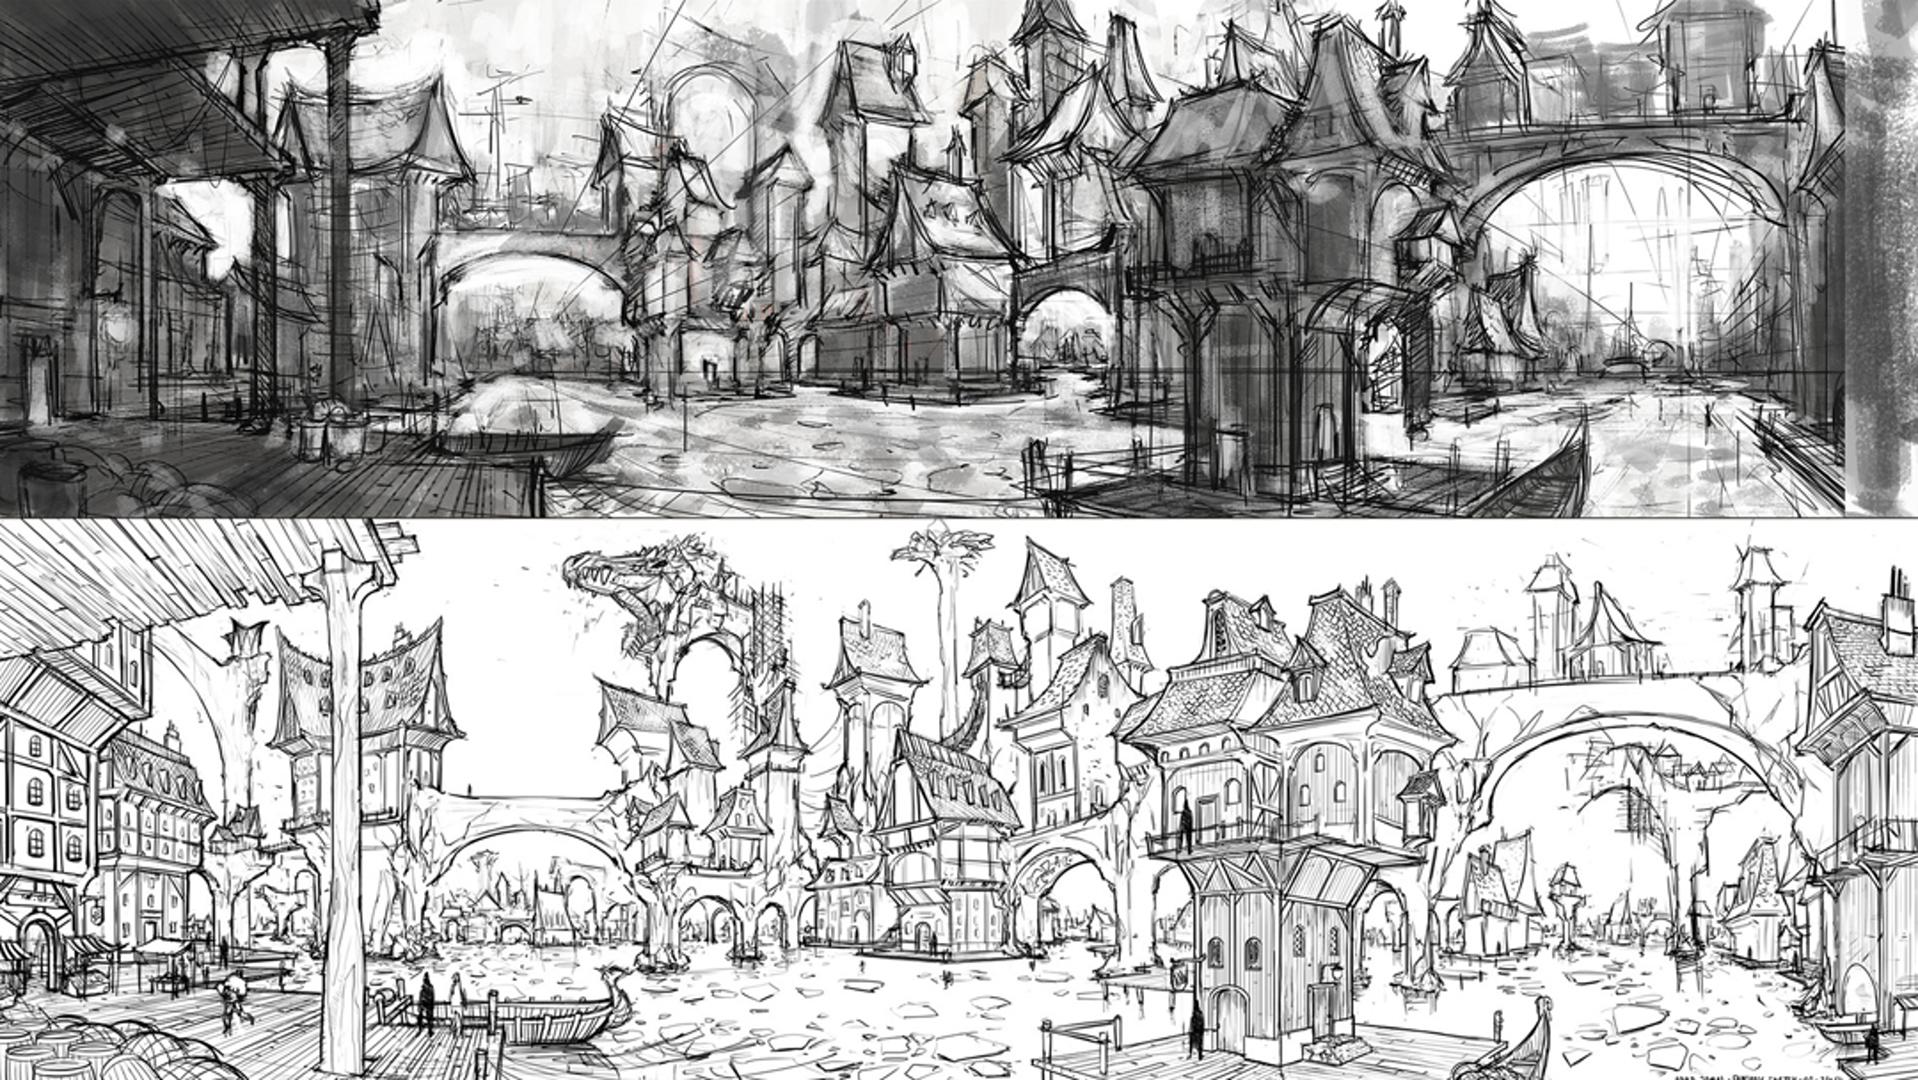 I was inspired by the Water Town in #TheHobbit film. I decided to sketch a Fantasy Village of my own.  .  .  .  .  .  .  #instasketch #quicksketch #drawingsketch #sketchdaily #watertown #fantasyartwork #designsketch #sketchingart #illustrationsketch #adobesketch #artsketch #dailysketches #sketchingdaily #pencilsketching #fantasysketch #artfantasy #fantasyartists #sketchin #messysketch #archsketch #sketchinstadaily #sketchartgallery #architecturalsketch #dailysketchbook #quicksketching #citysketc